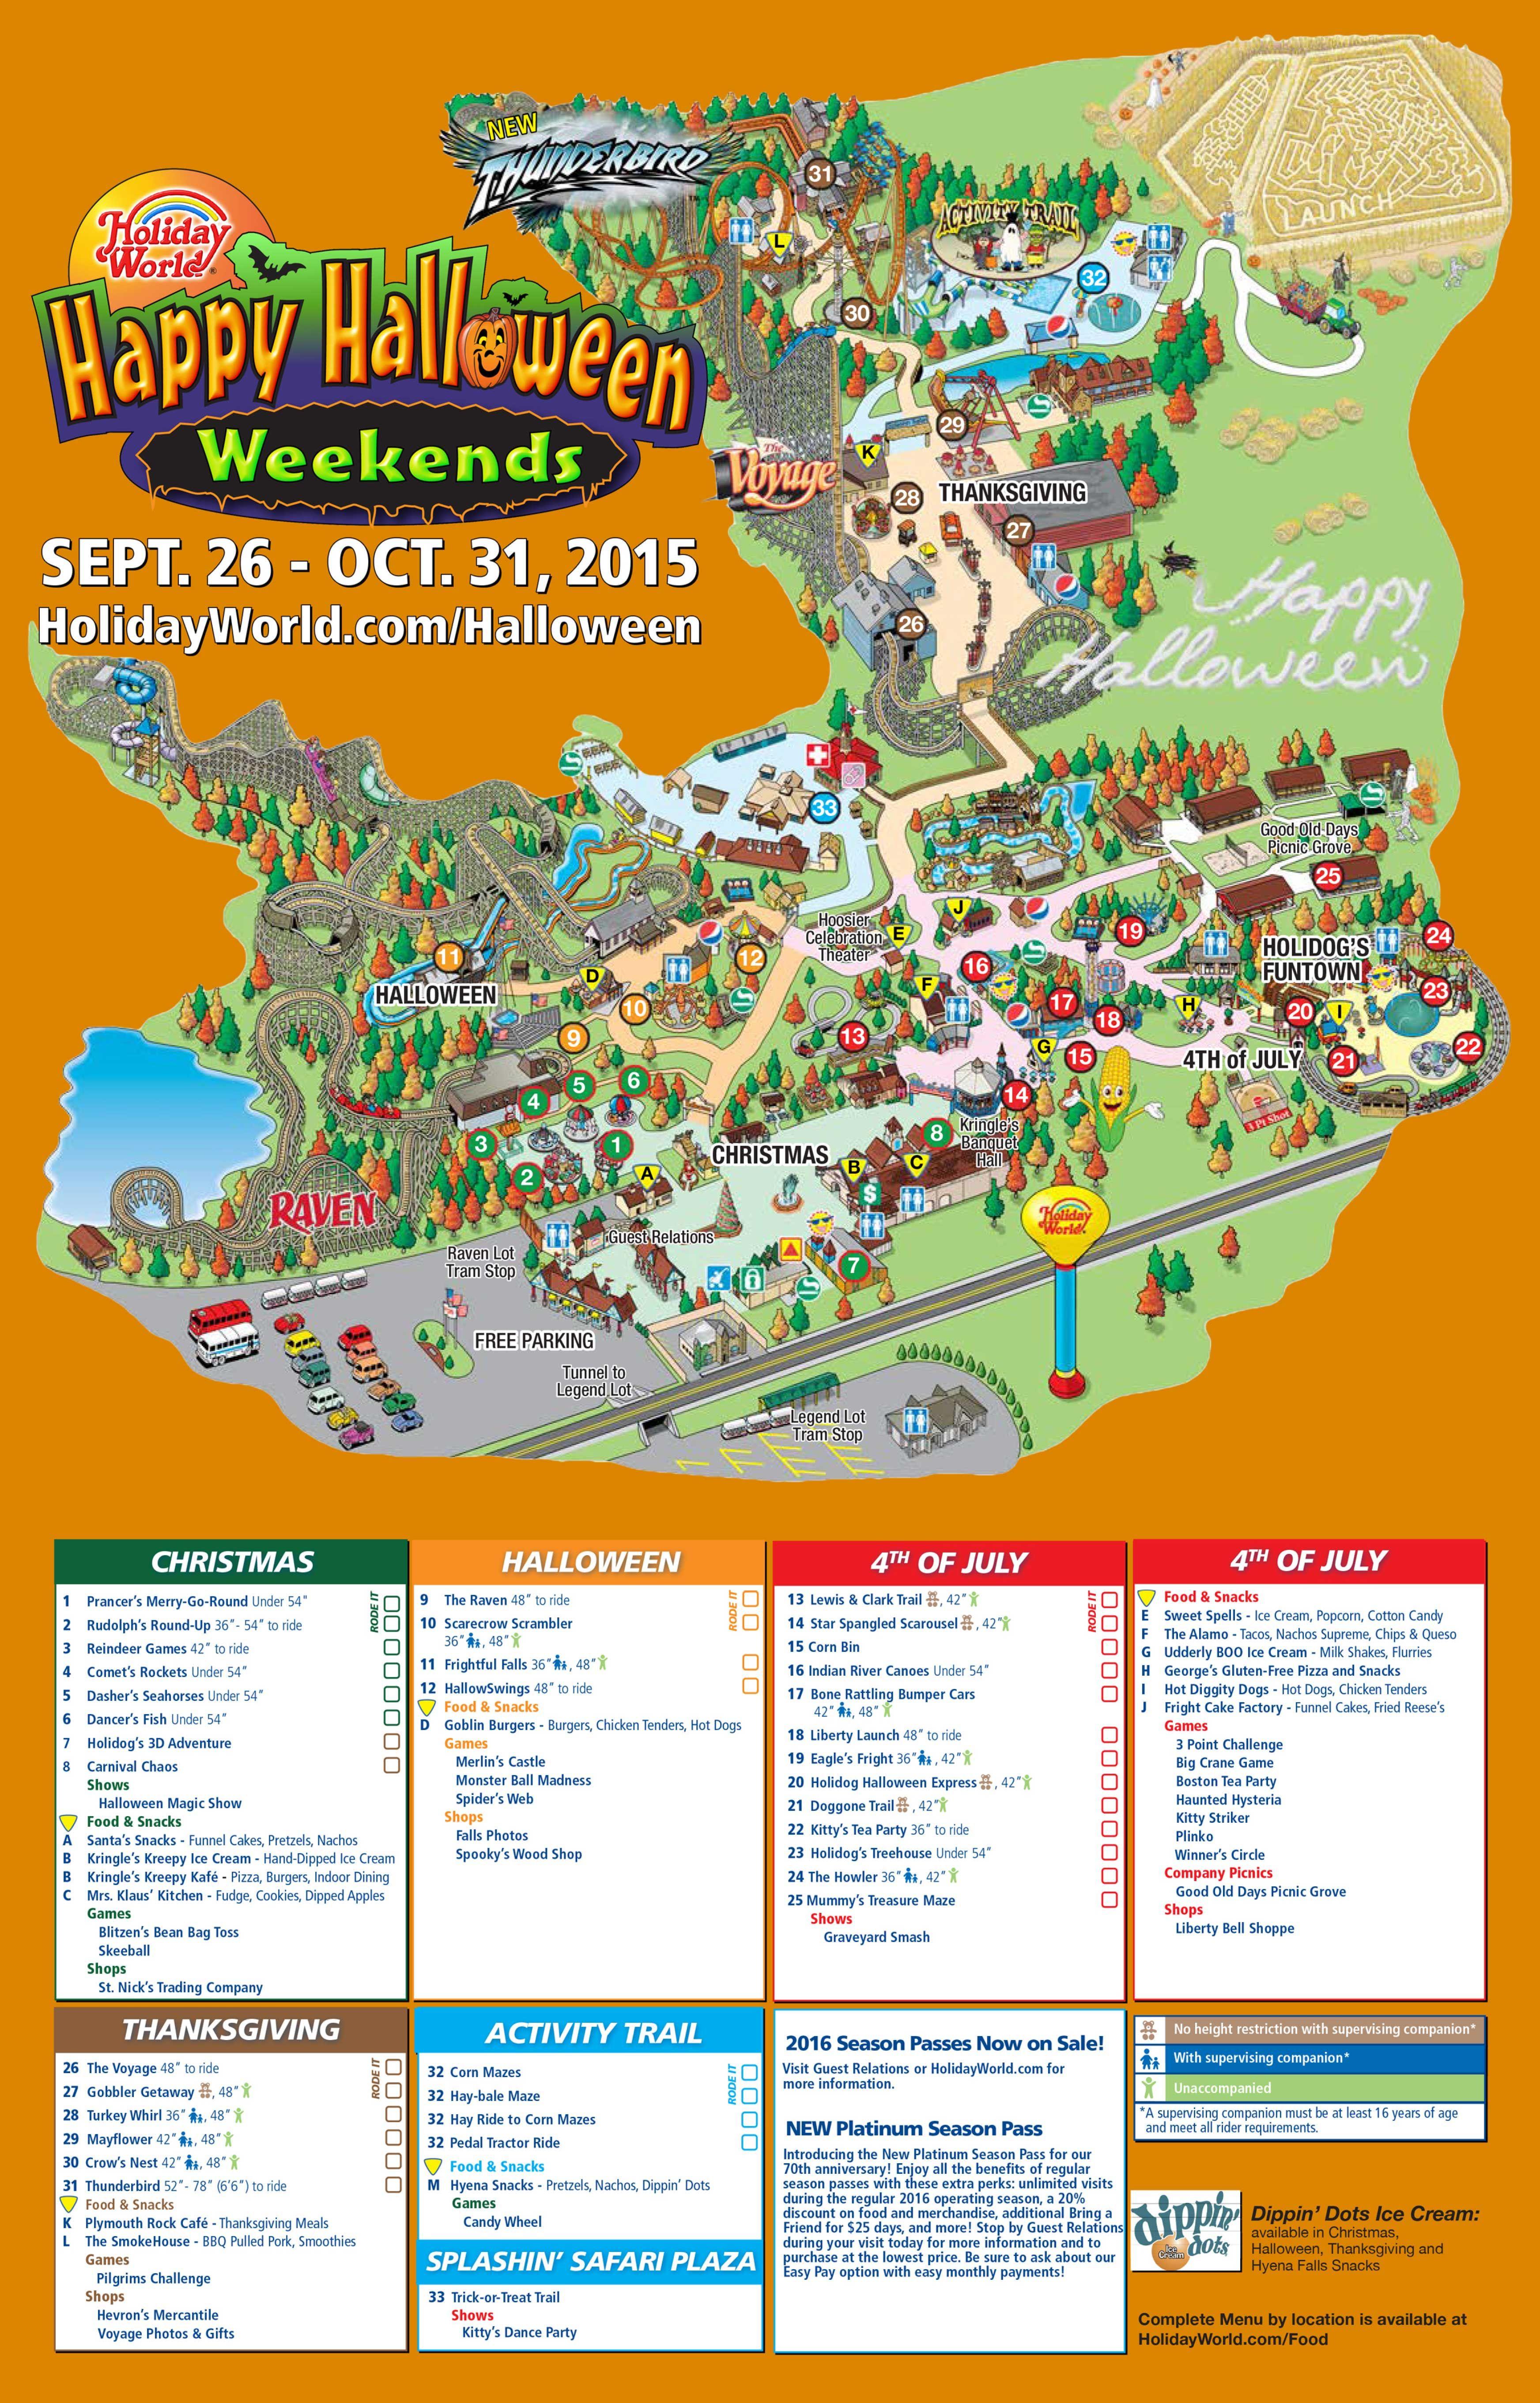 Splashin' Safari Park Map in 2019 | Holiday world, Holiday ... on malaysia map, thailand map, disneyland map, bangkok map, lumpini park map, amusement park map, erawan shrine map, drayton manor theme park map, cambodia map, zoo map, singapore map,